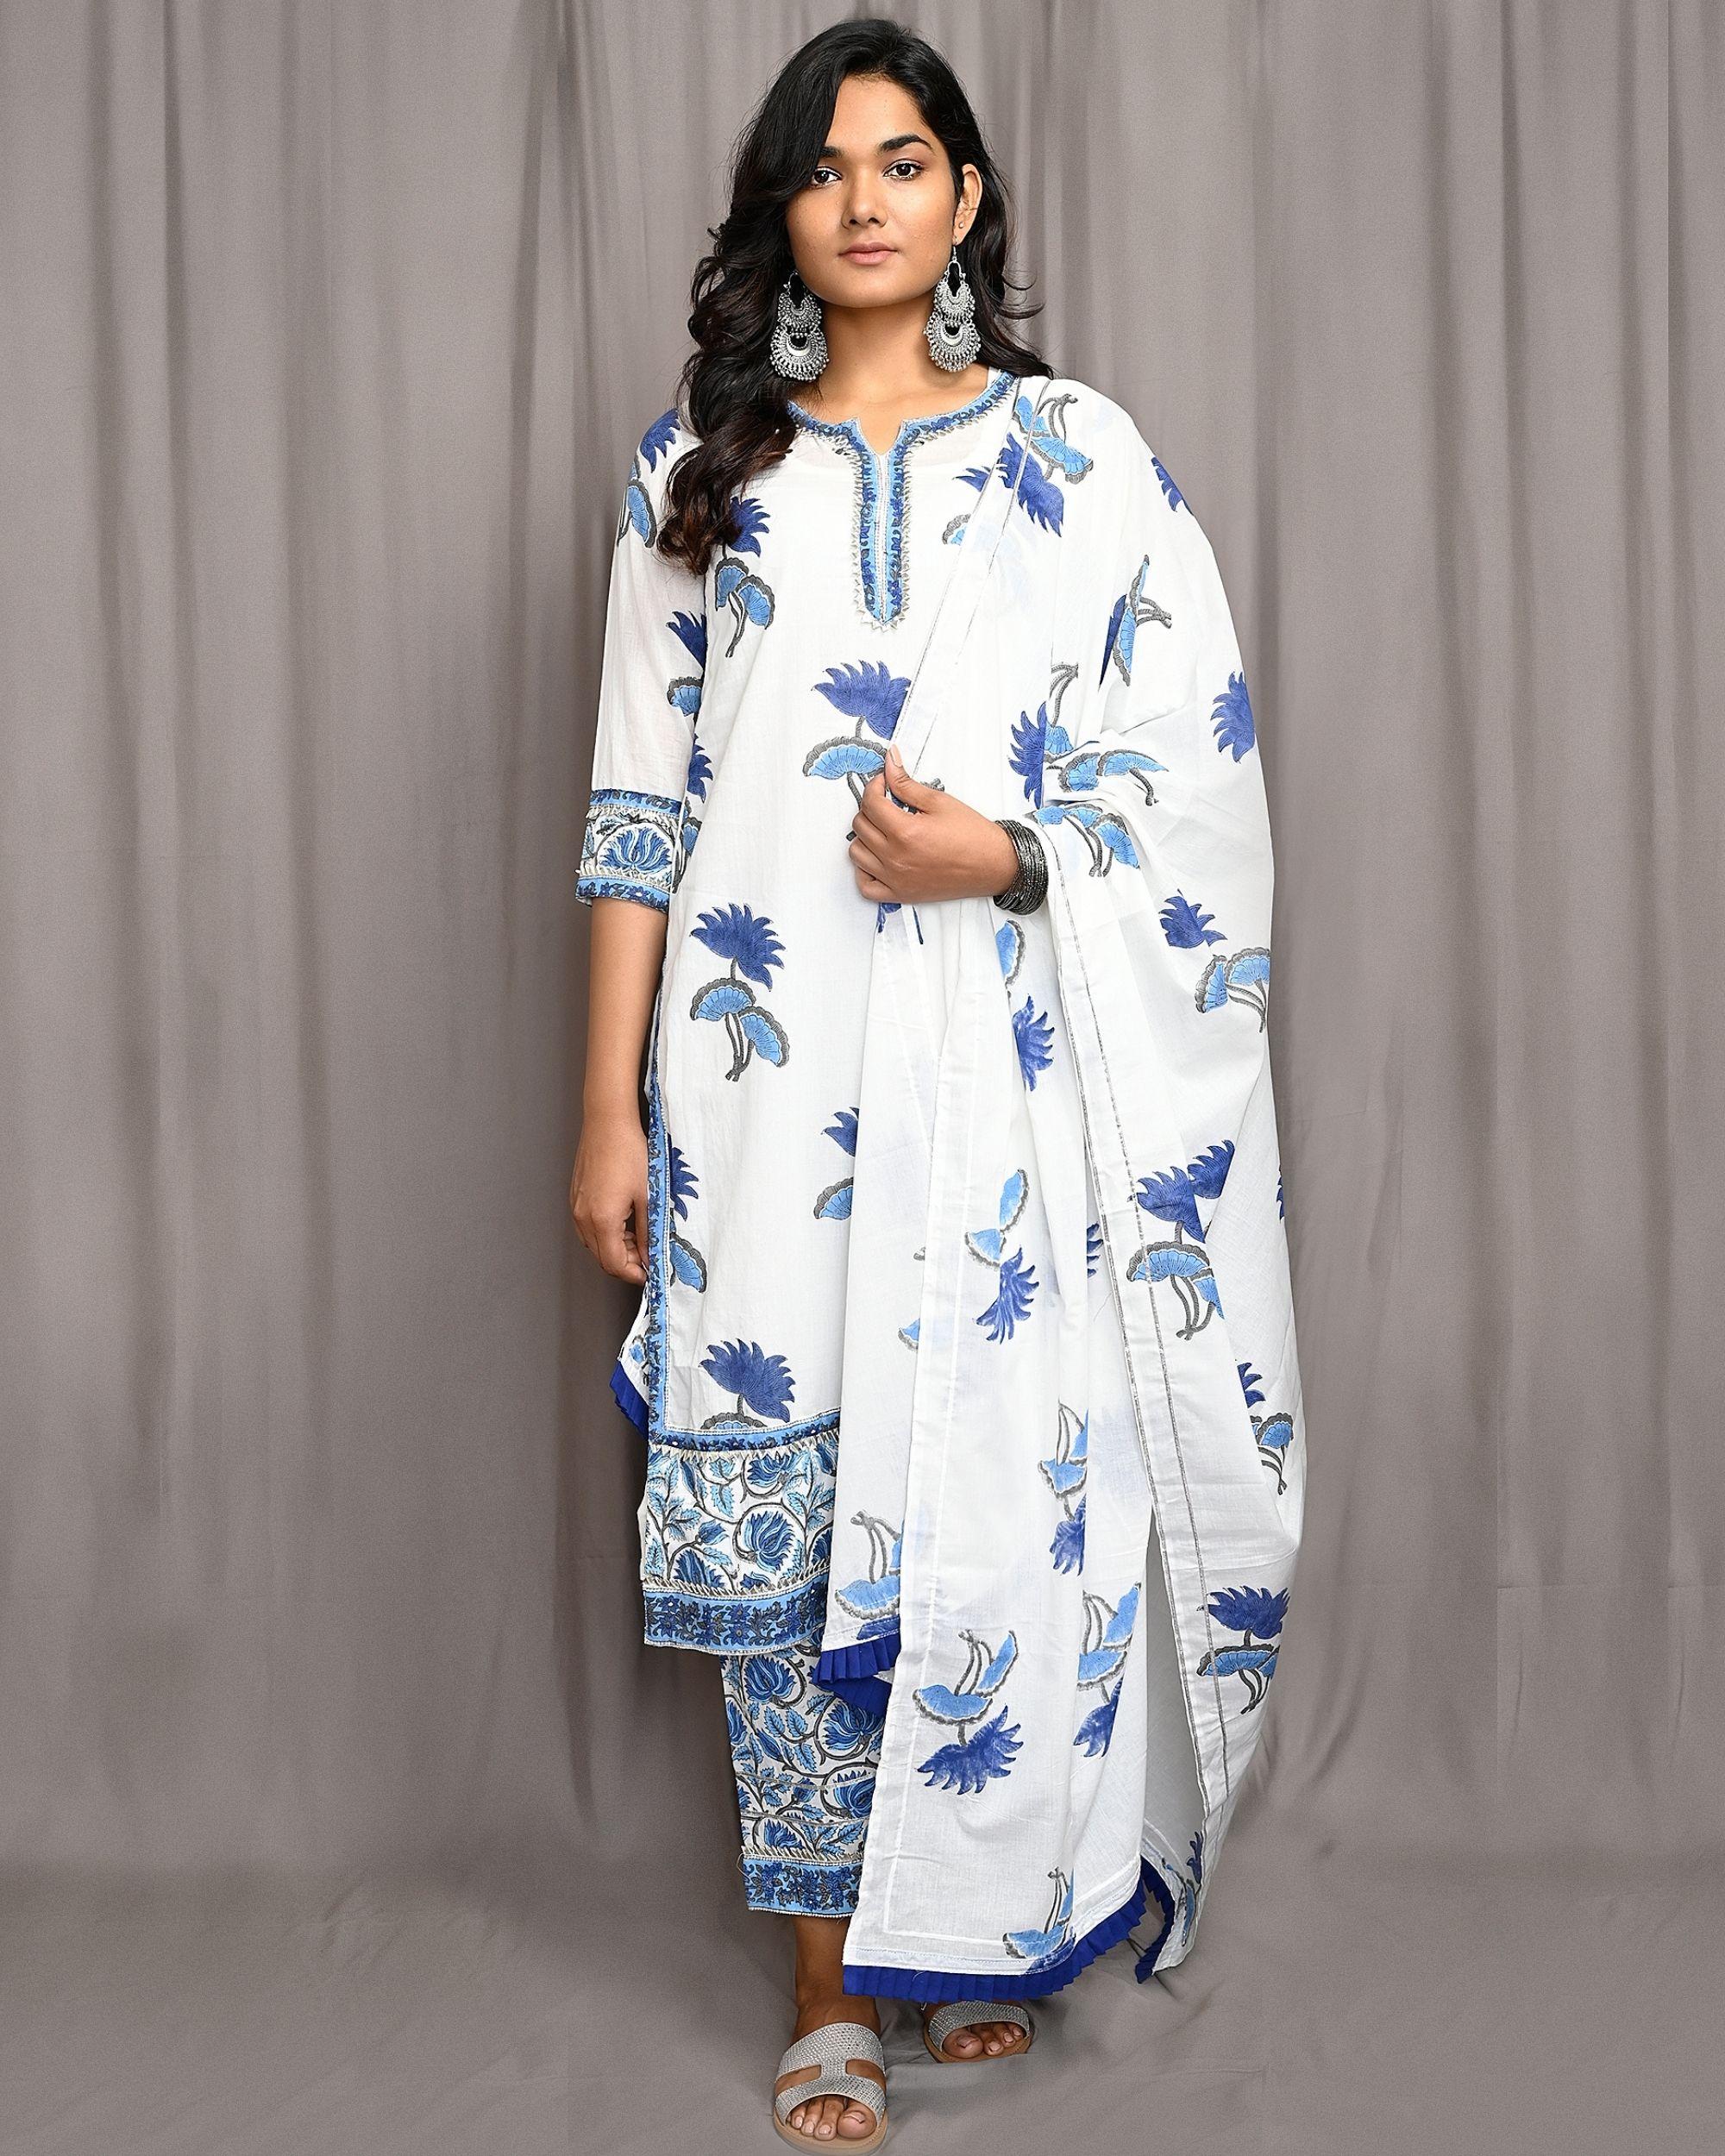 White and blue floral printed paneled kurta